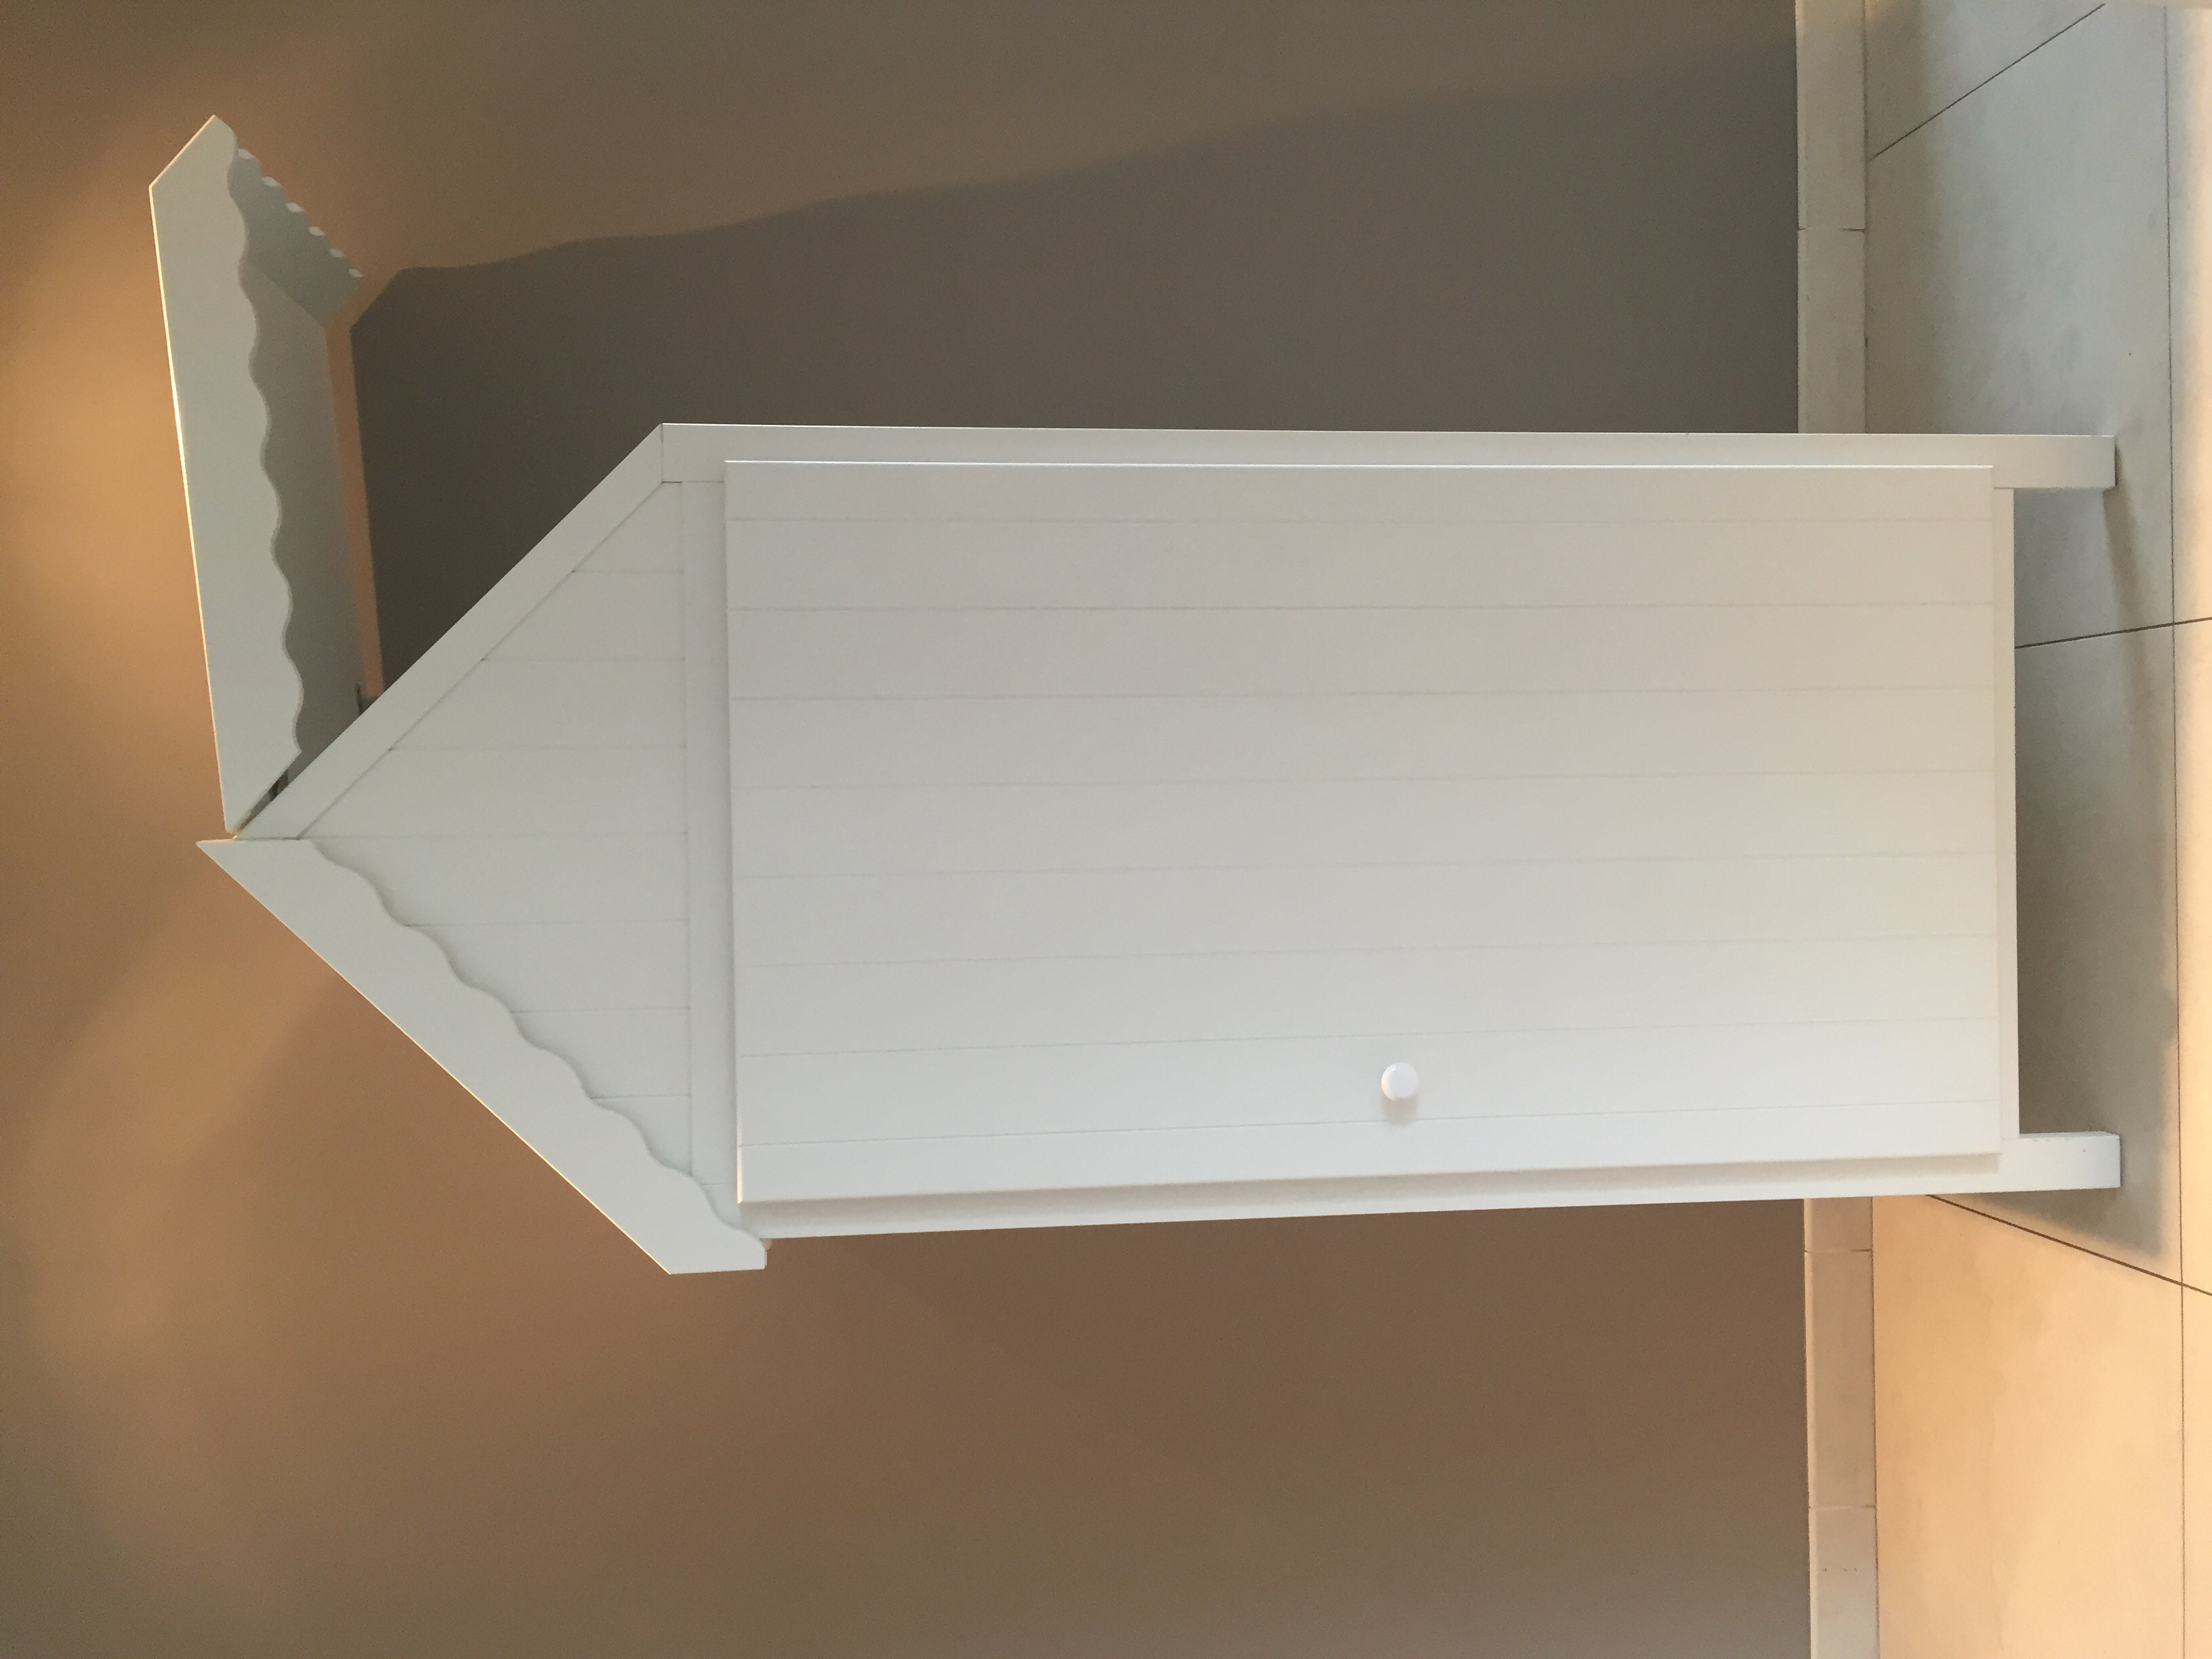 D coration armoire chambre kitea montpellier 3321 for Bureau kitea